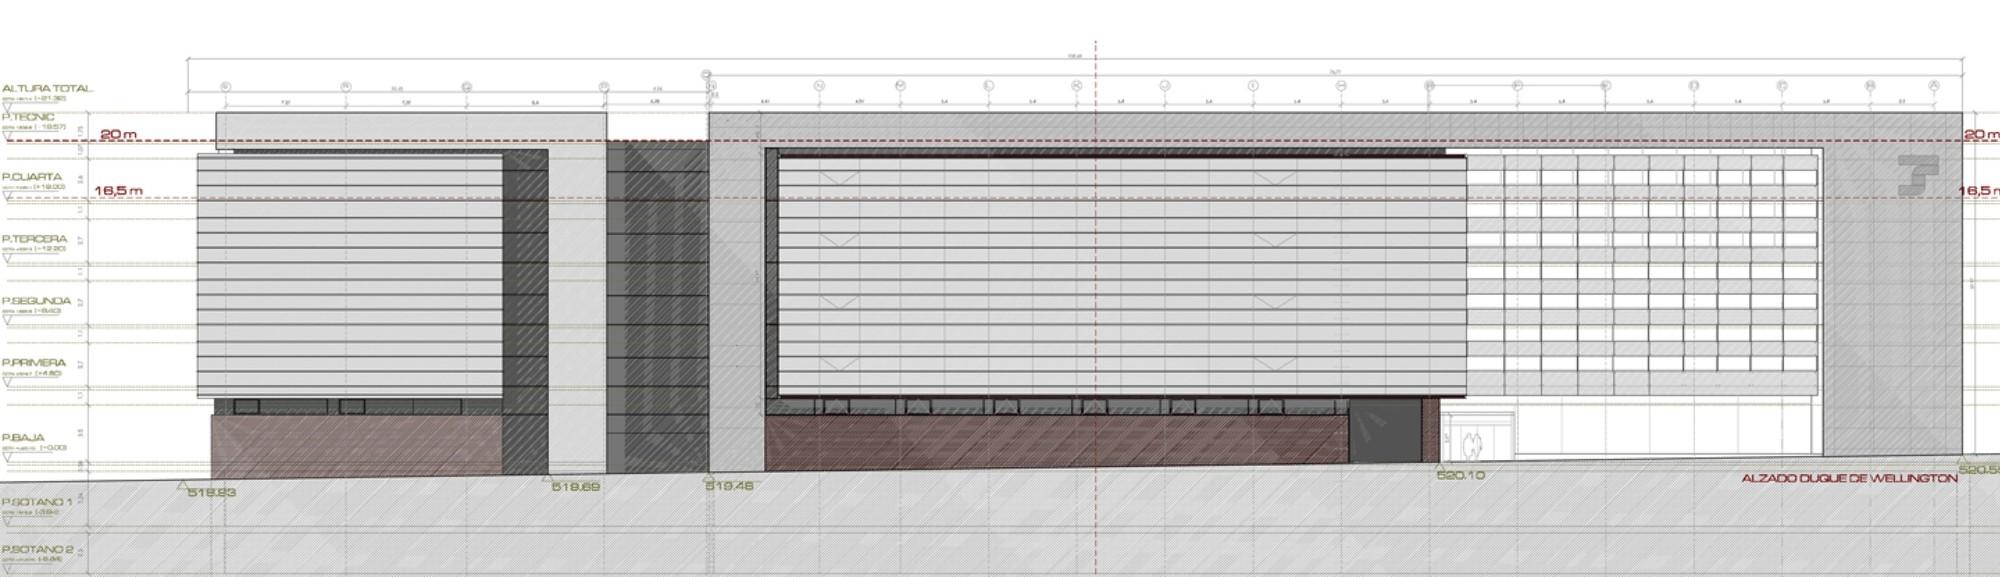 Galer a de edificio de oficinas en vitoria lh14 arquitectos 13 - Arquitectos en vitoria ...